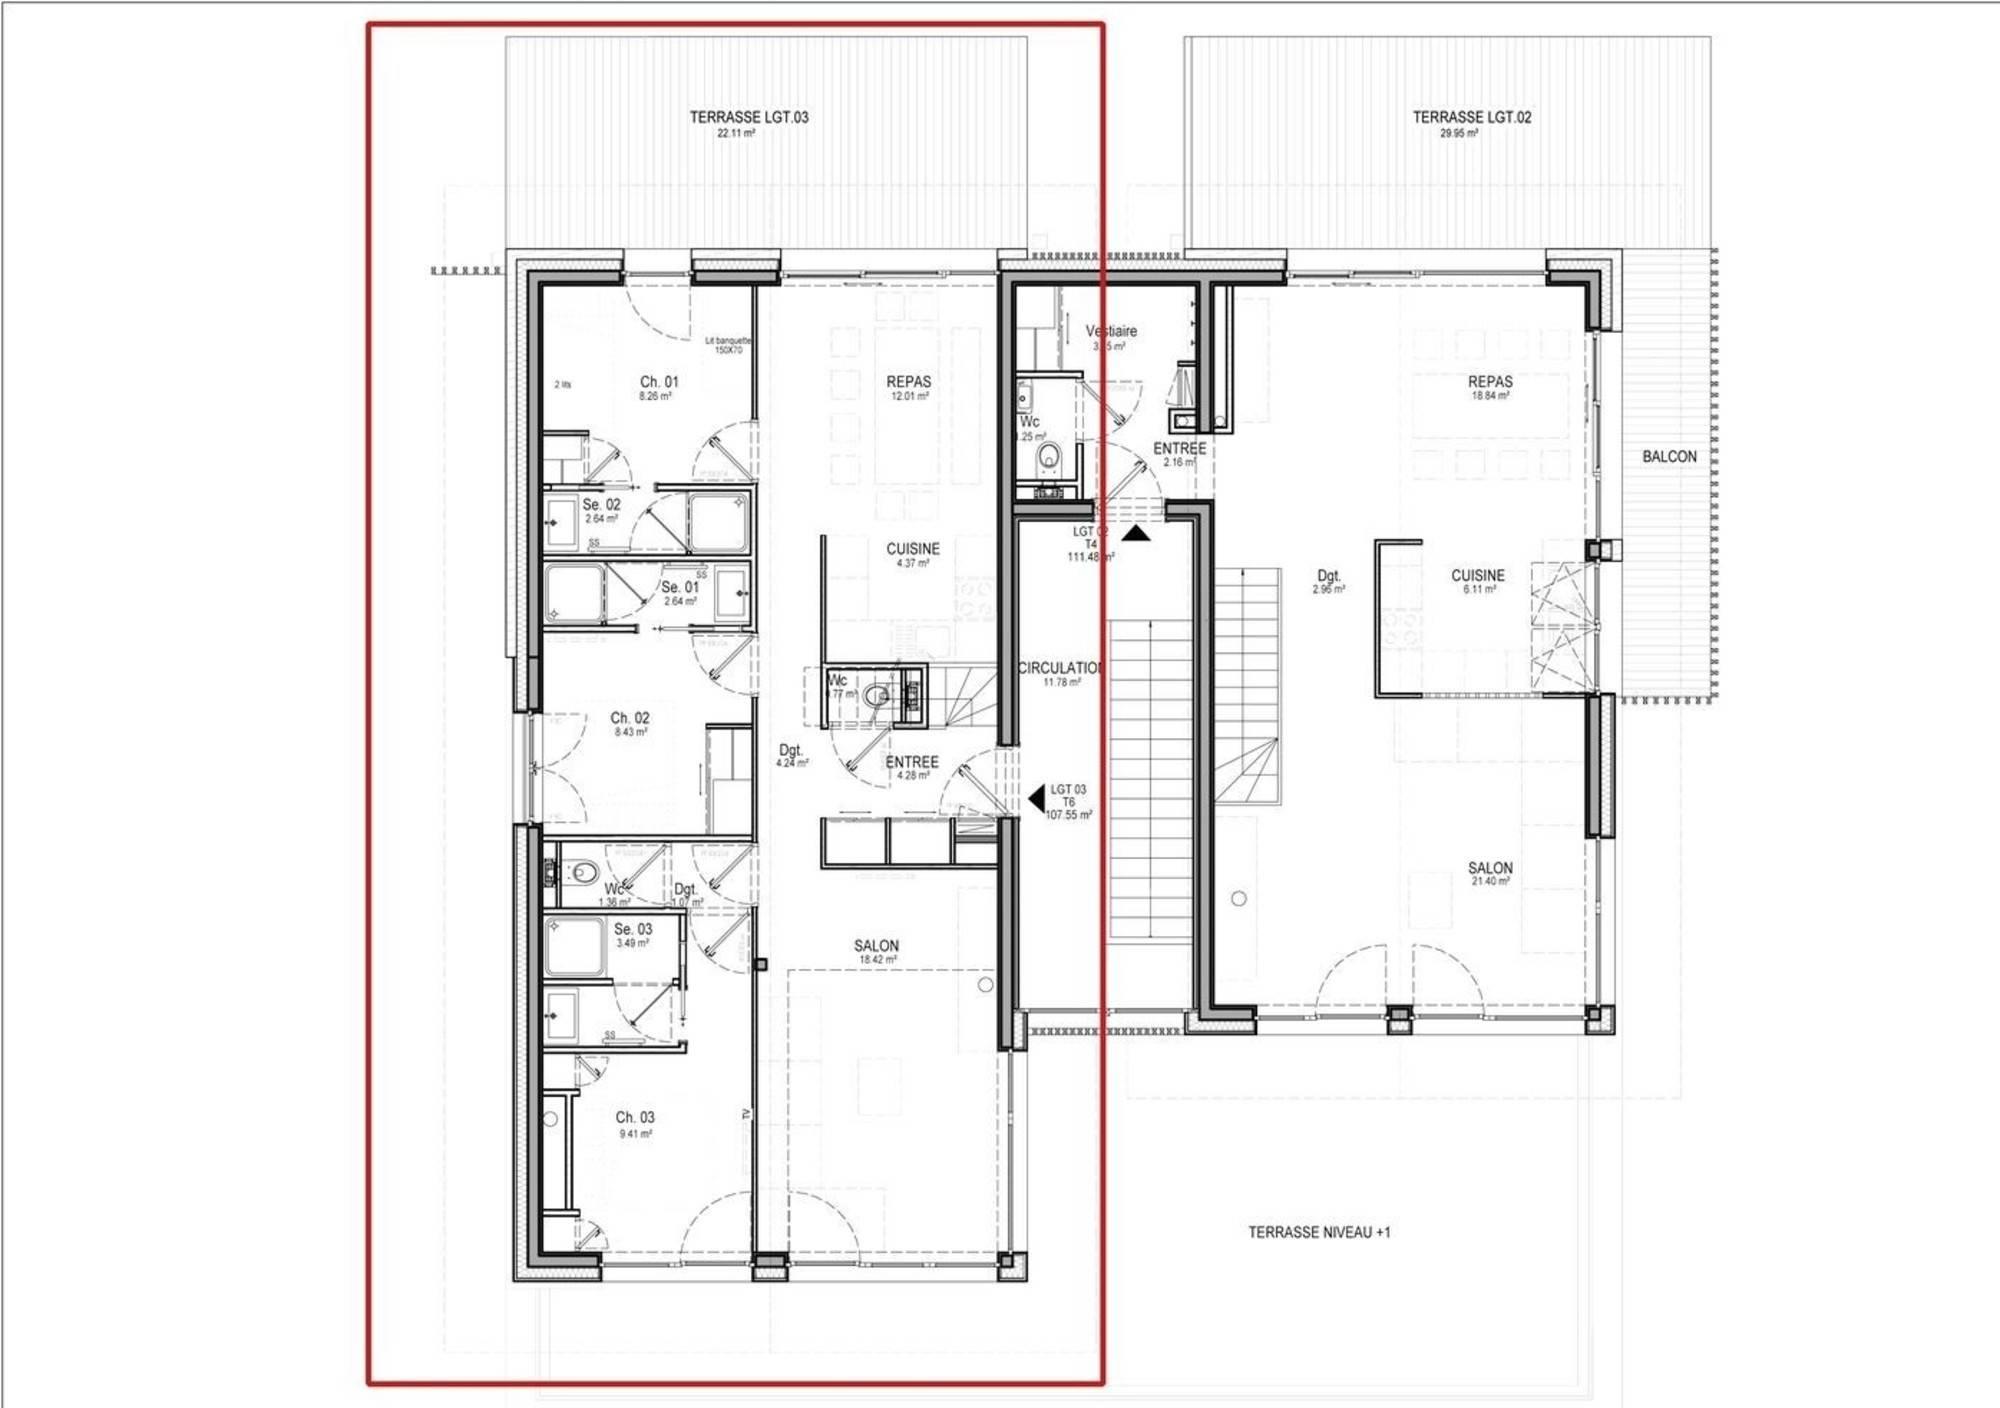 Apartment Home 5 St-Martin-de-Belleville Floor Plan 2